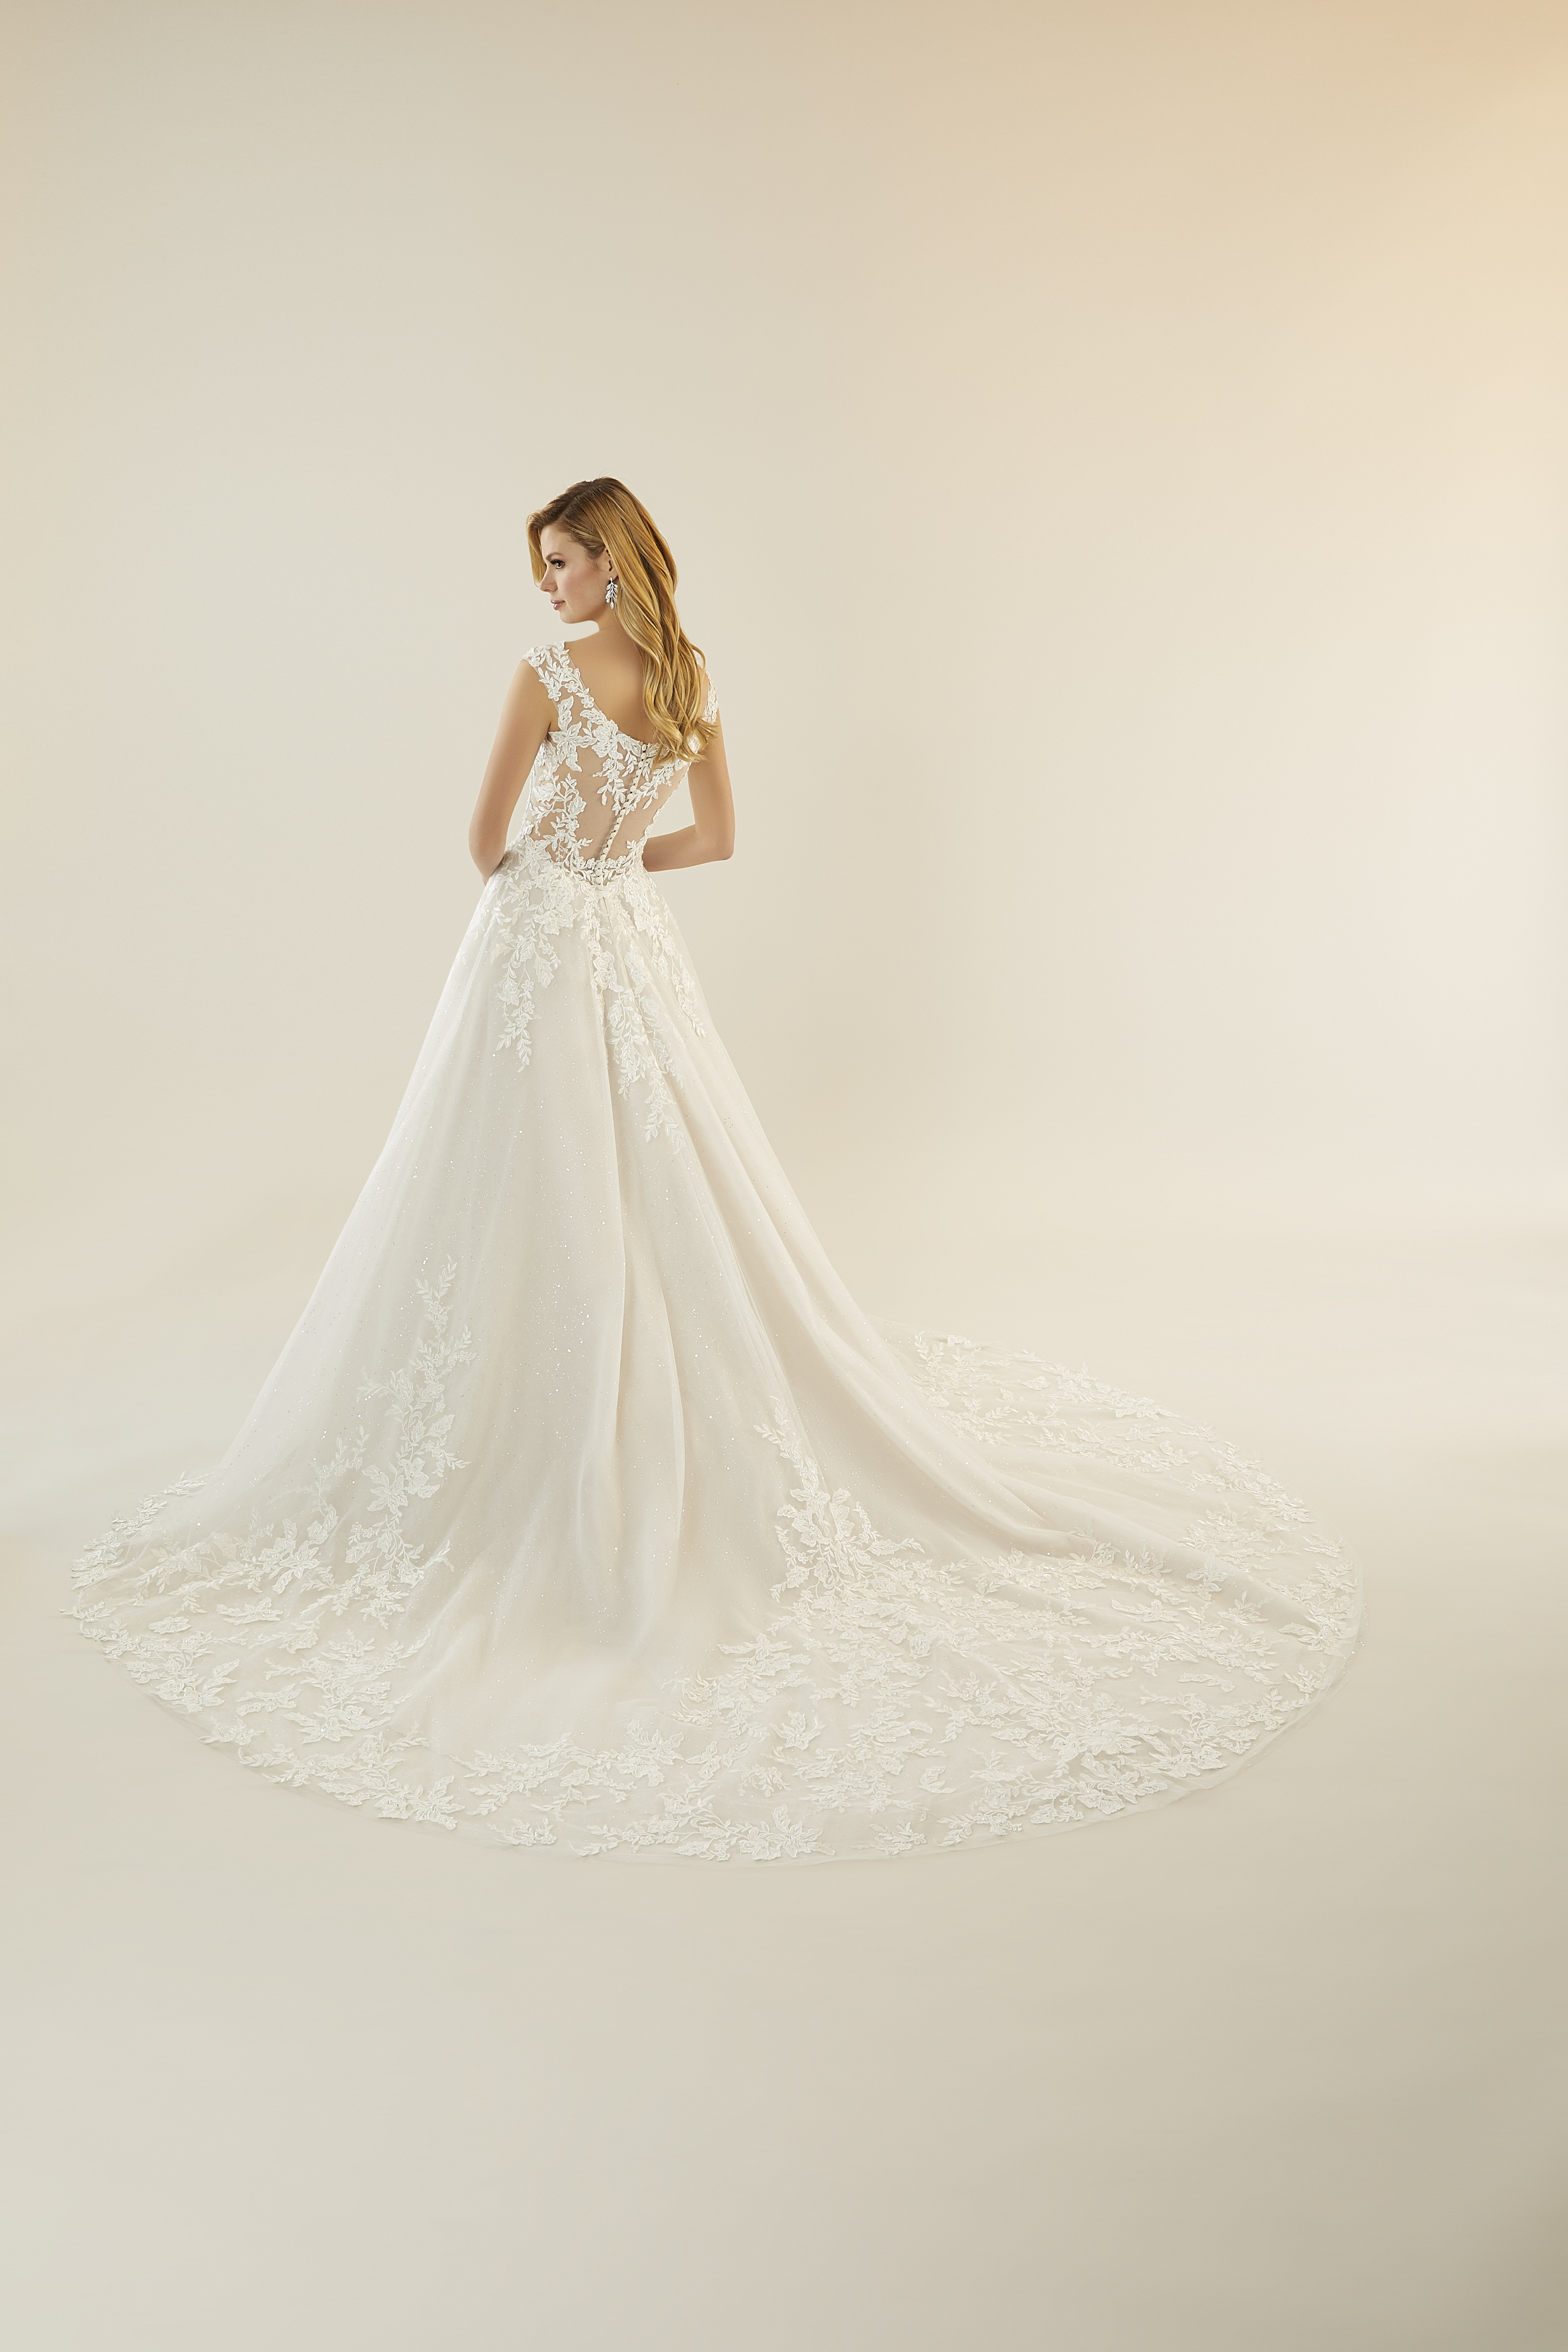 Madeline-Gardner-New-York-51747-wedding-dress-maribel